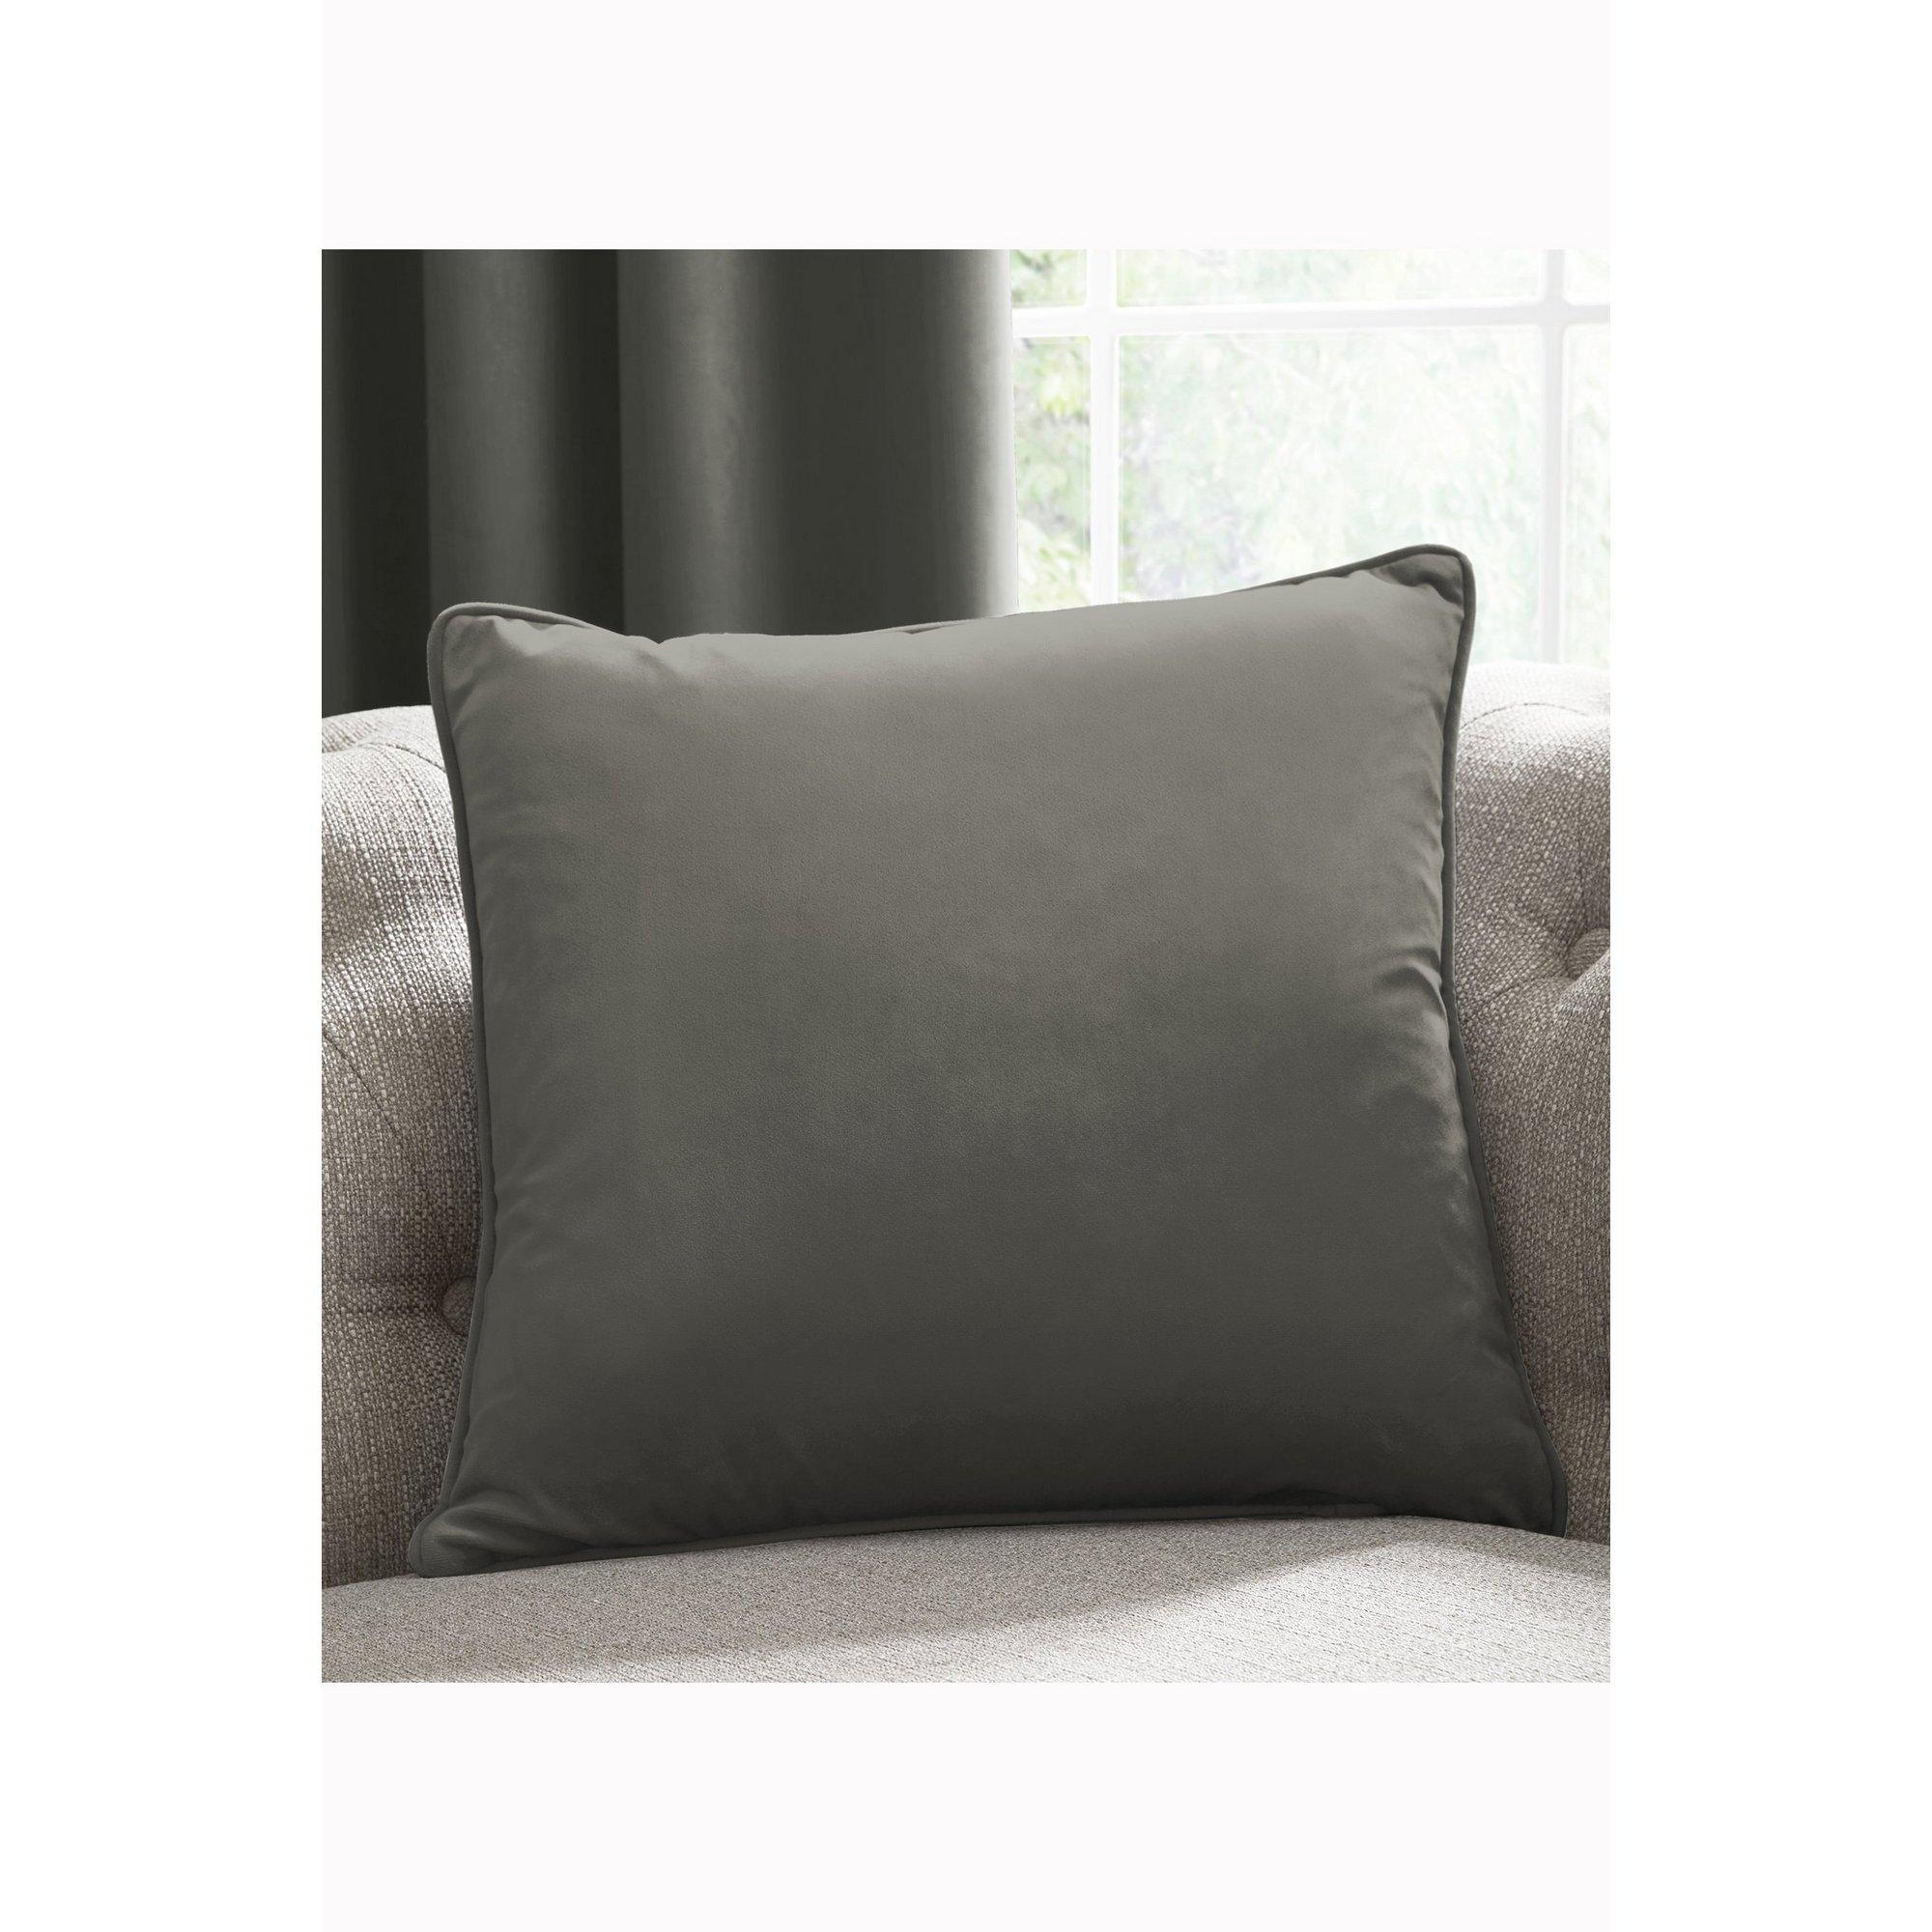 Image of Laurence Llewelyn Bowen Plain Velvet Cushion